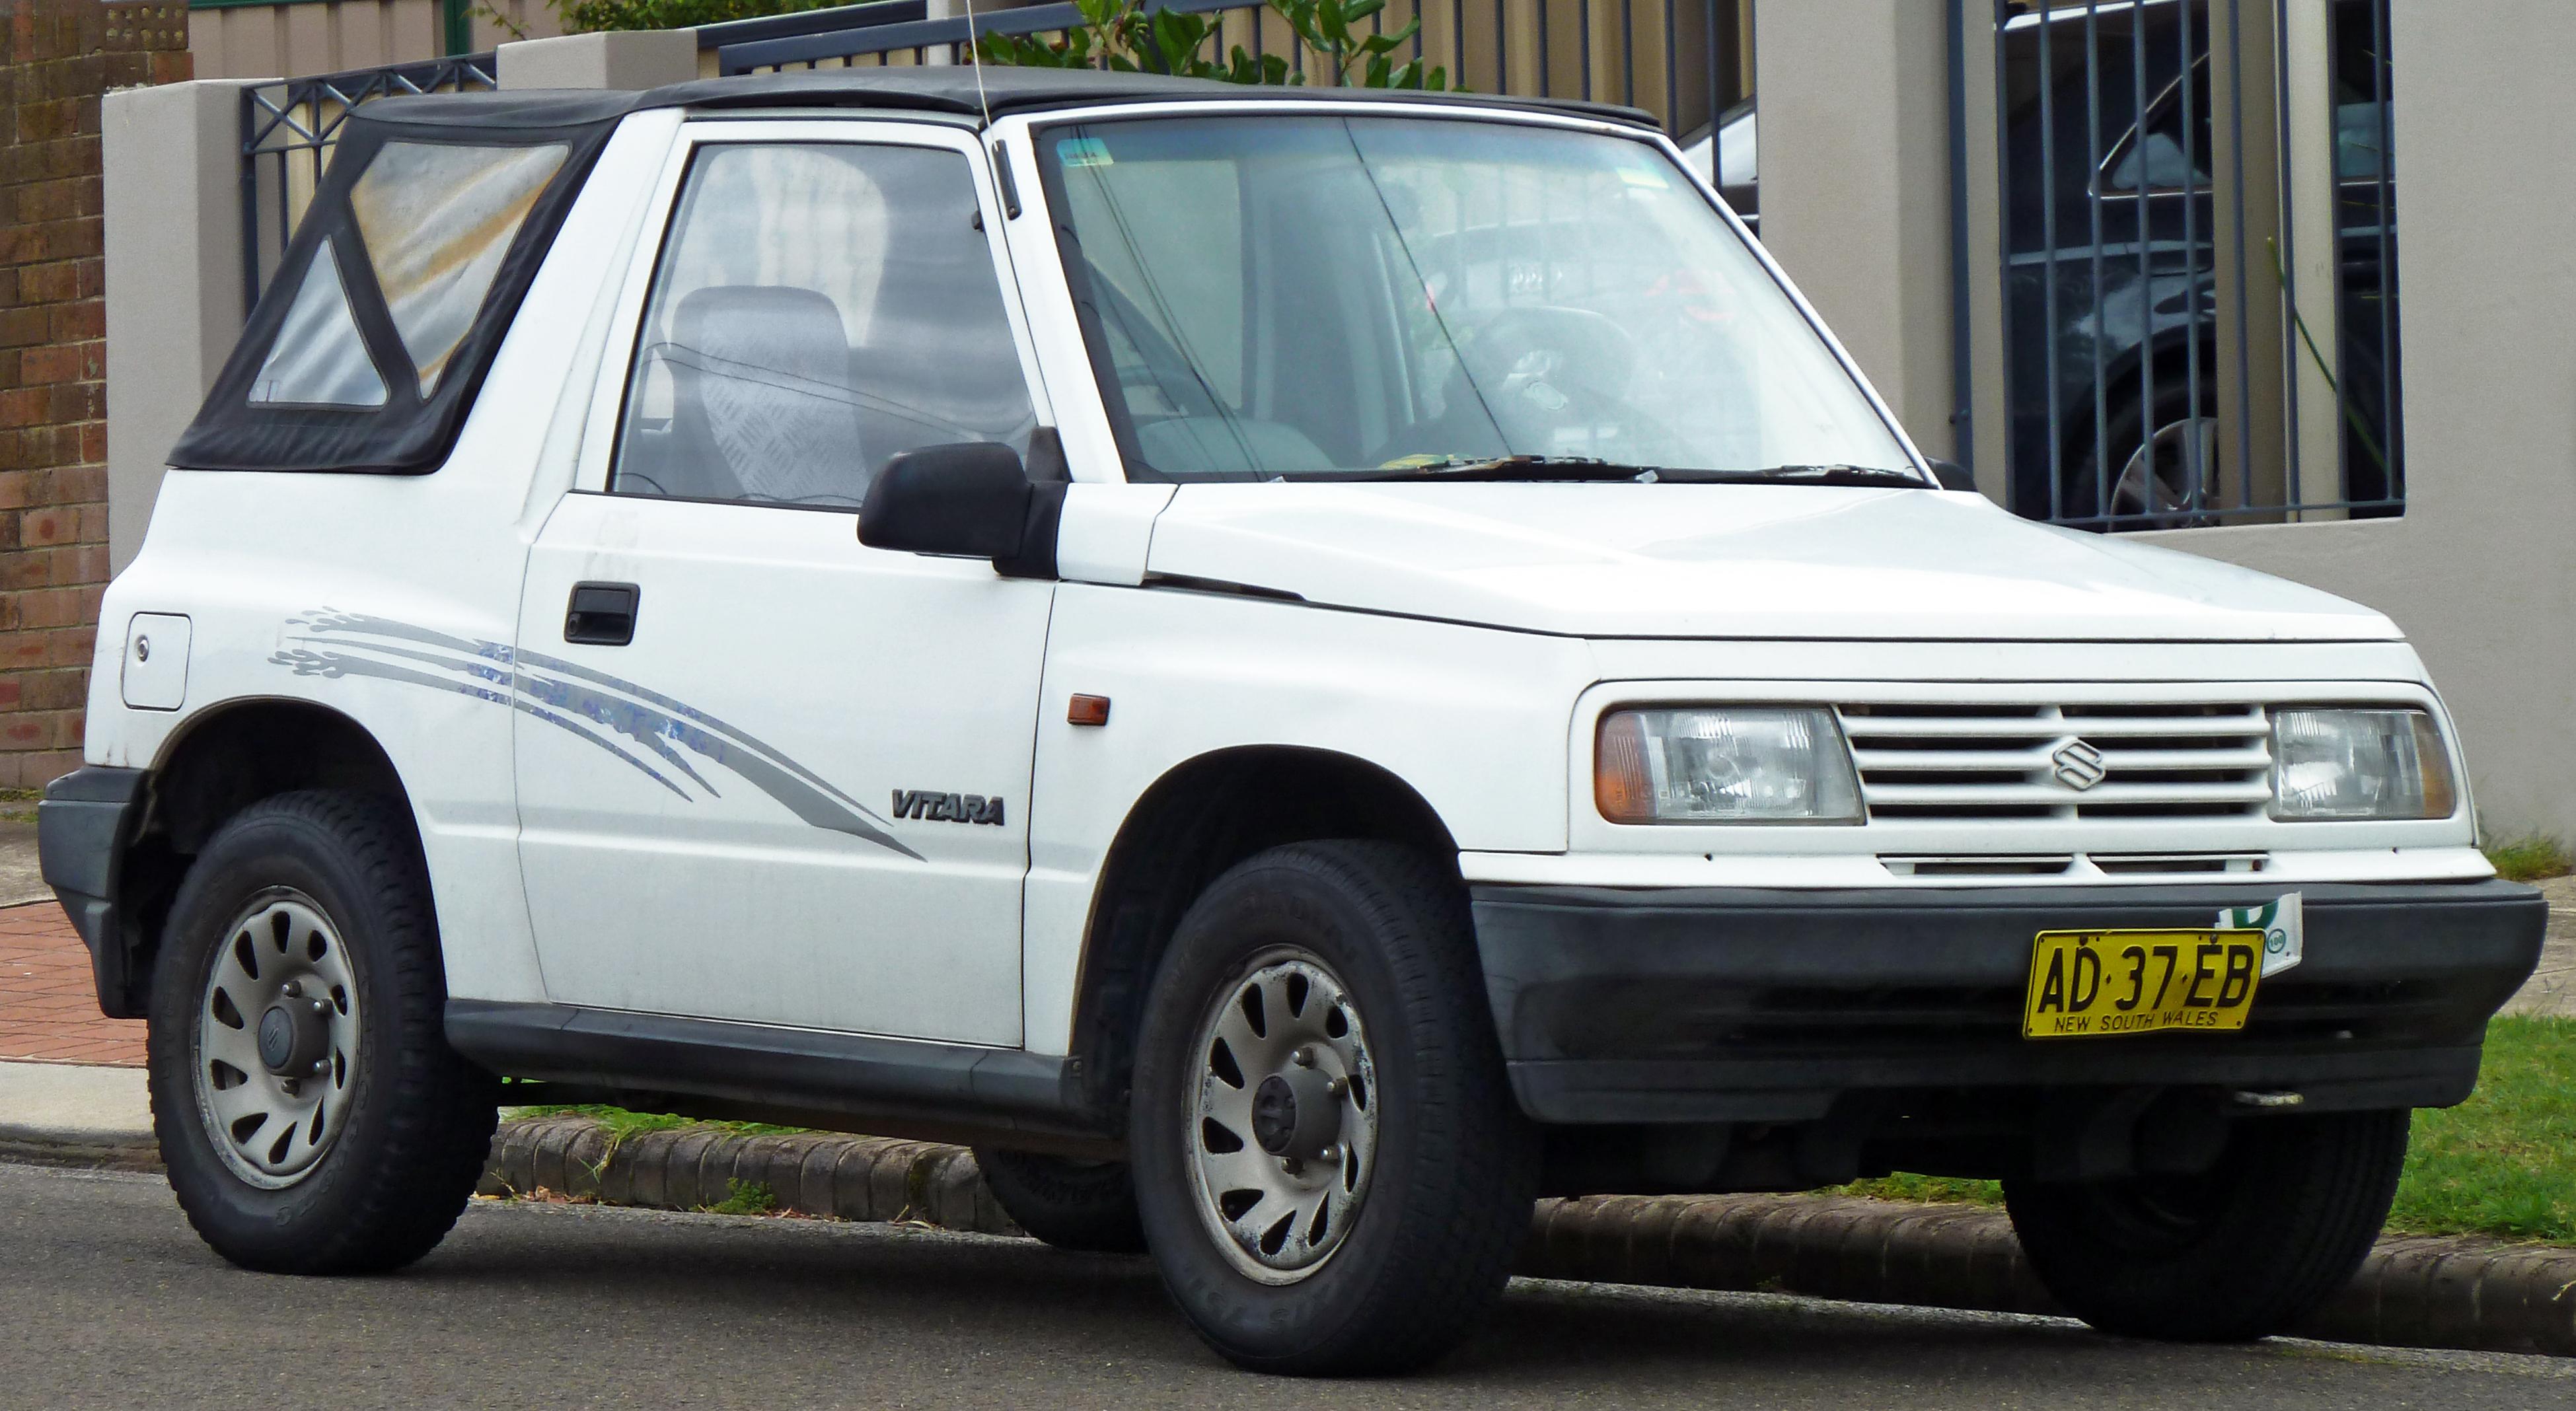 Watch besides Tracker Fuse Box On in addition 17208603 likewise 1995 Suzuki Sidekick Pictures C3557 in addition Suzuki Samurai Hubs. on 1992 suzuki sidekick jx